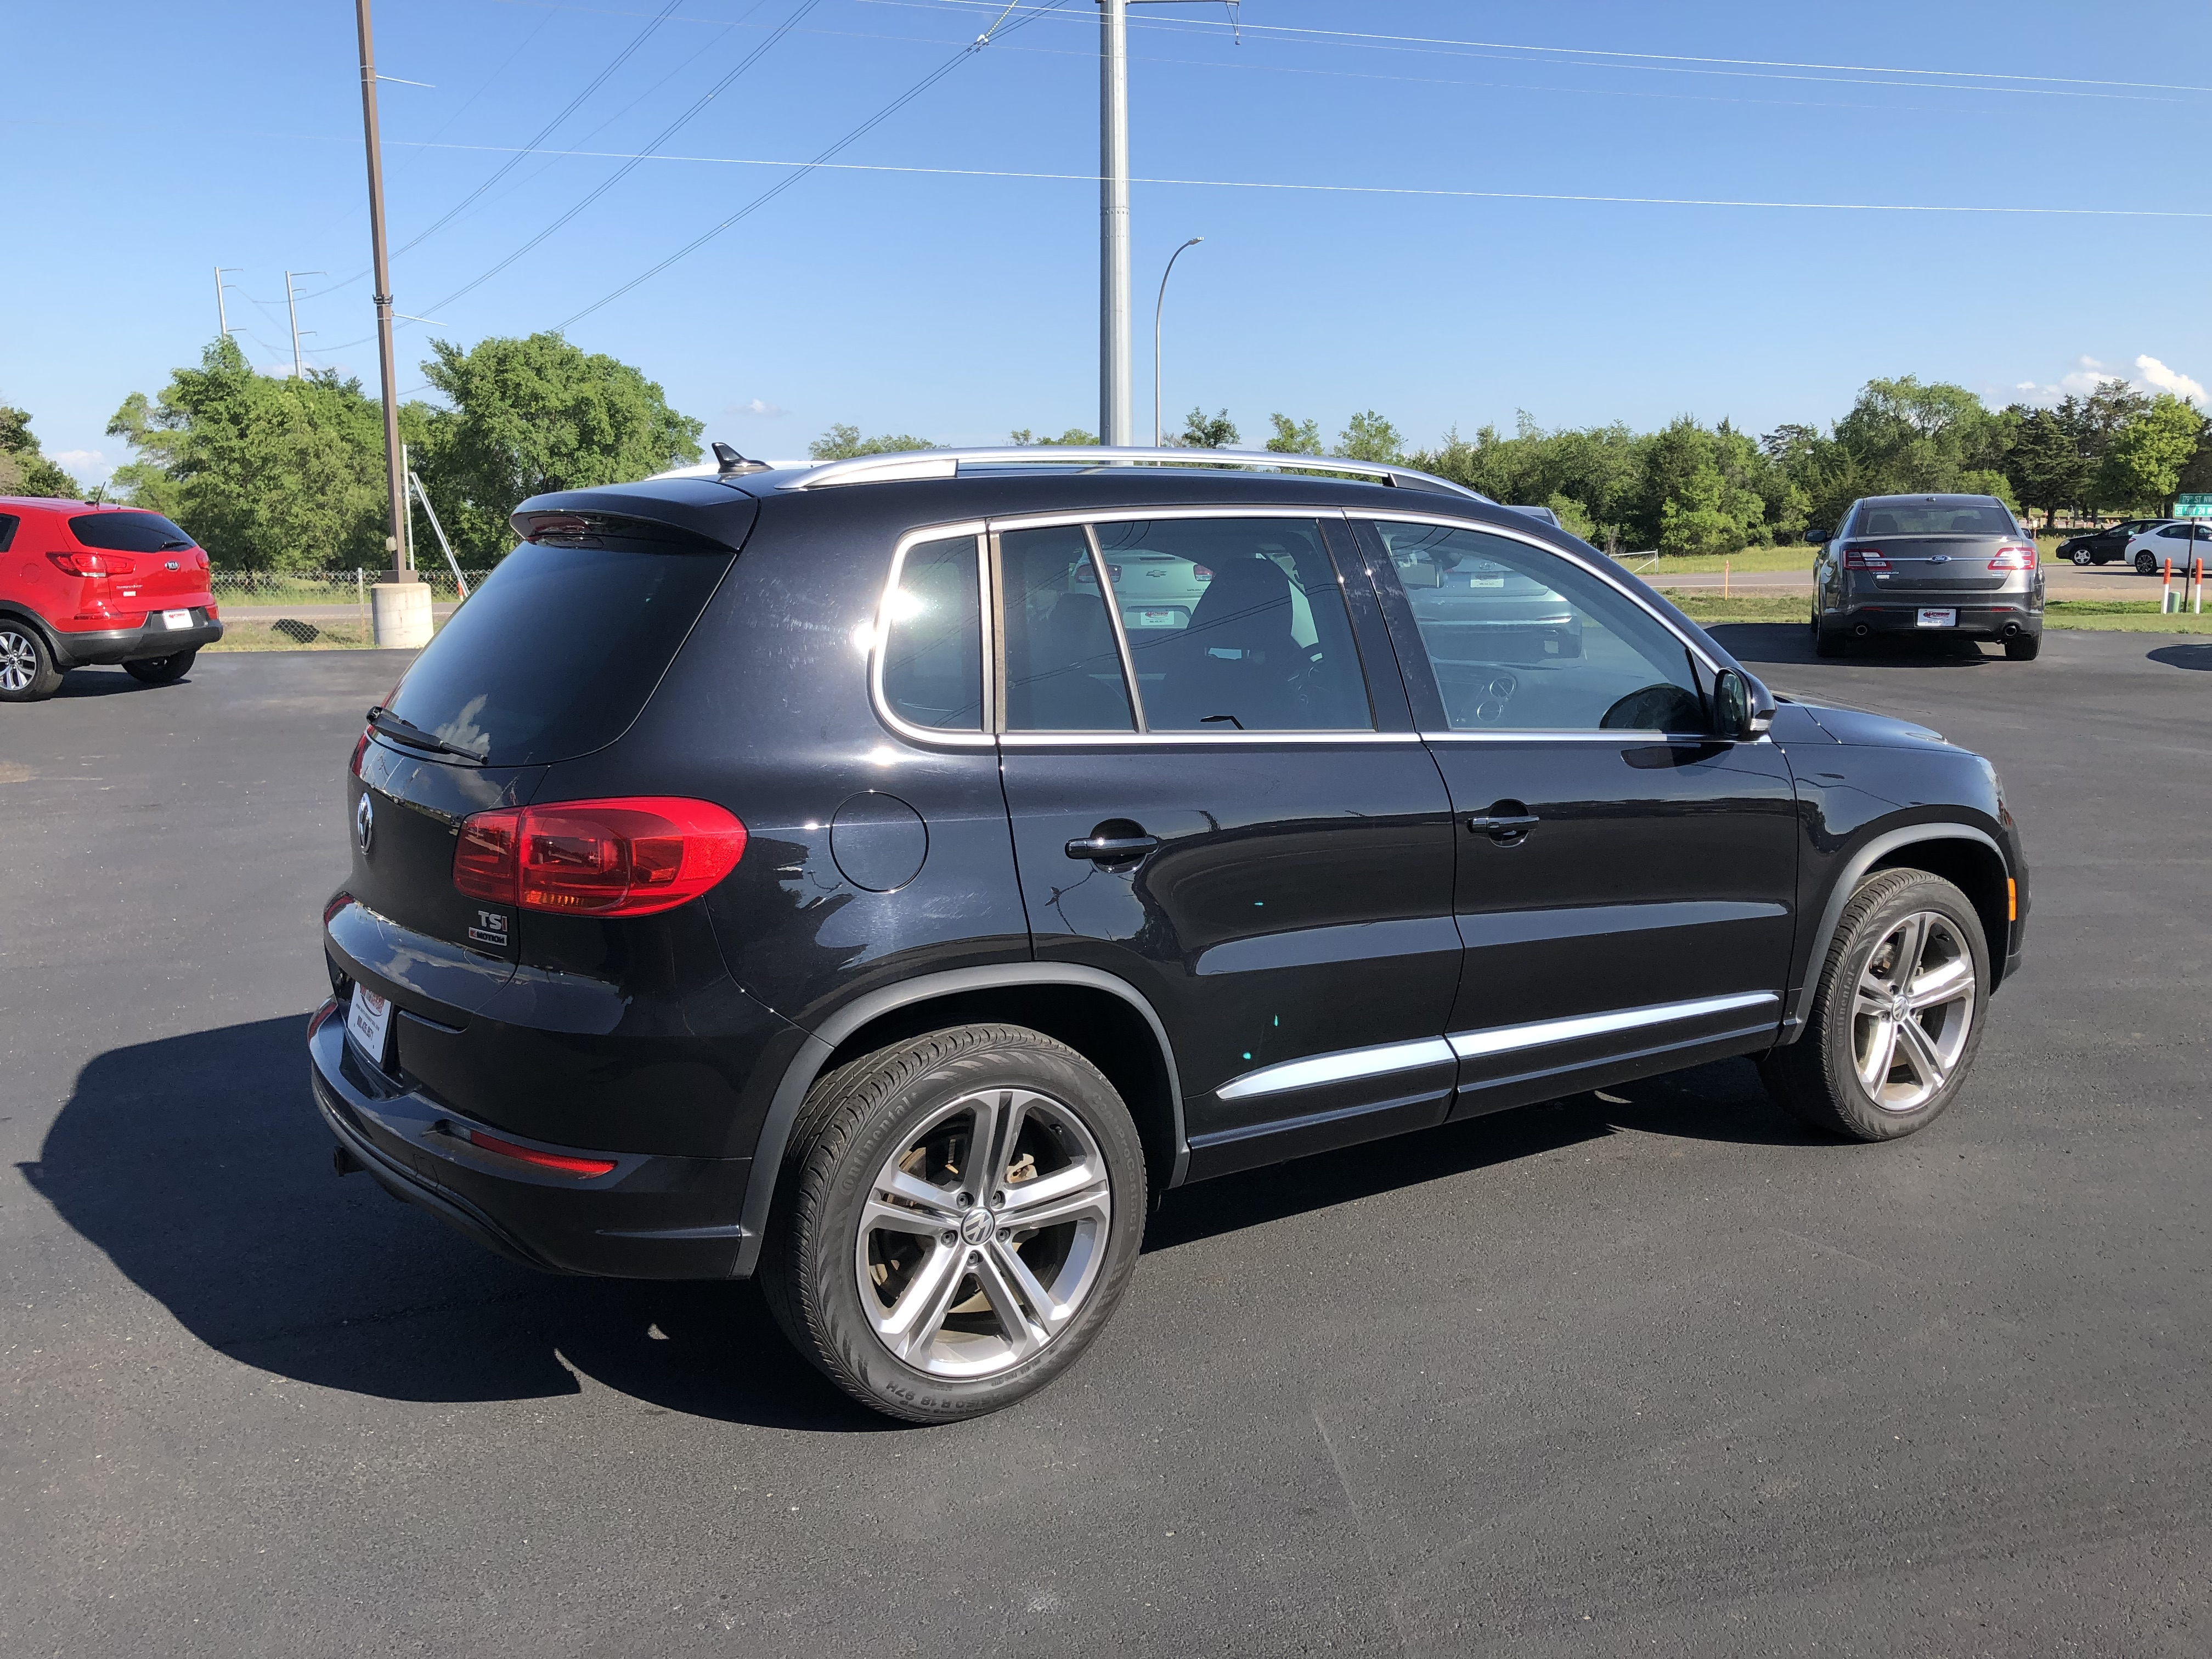 used vehicle - SUV Volkswagen Tiguan 2017